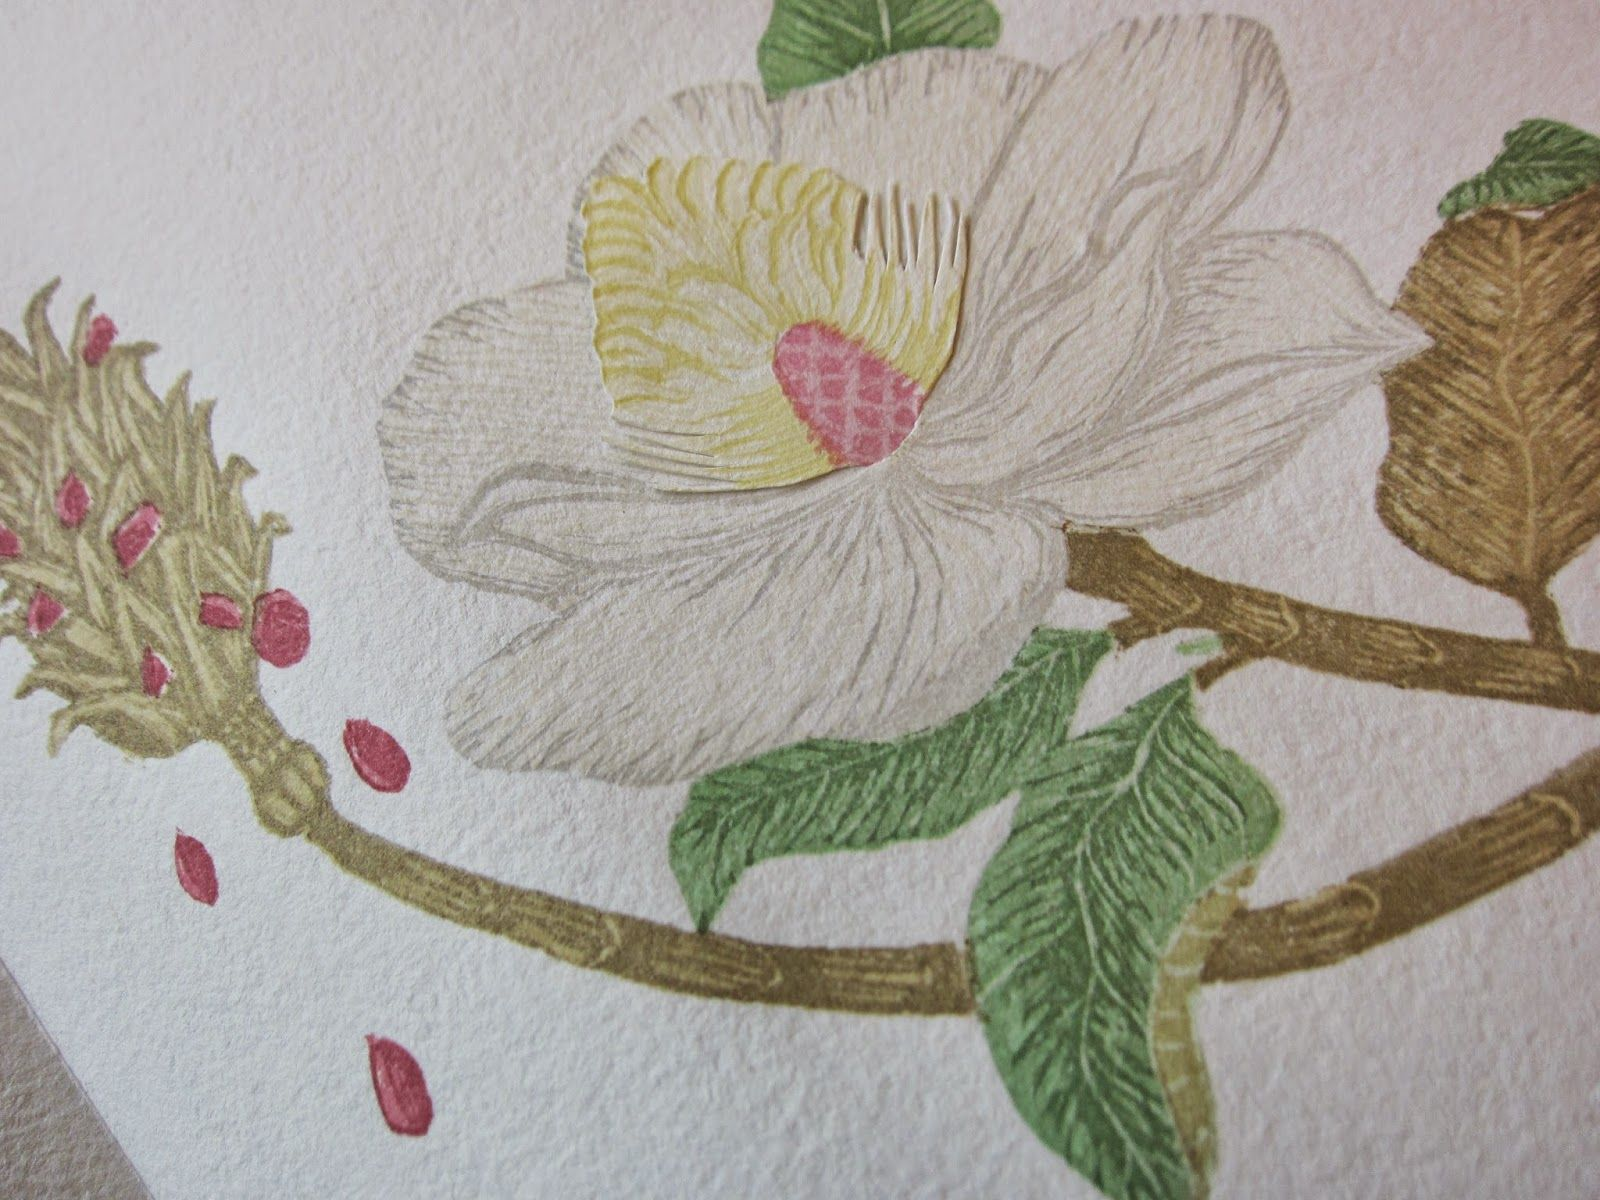 Rice Paper Tree: Anatomia Botanica | Artist Books | Pinterest | Anatomía